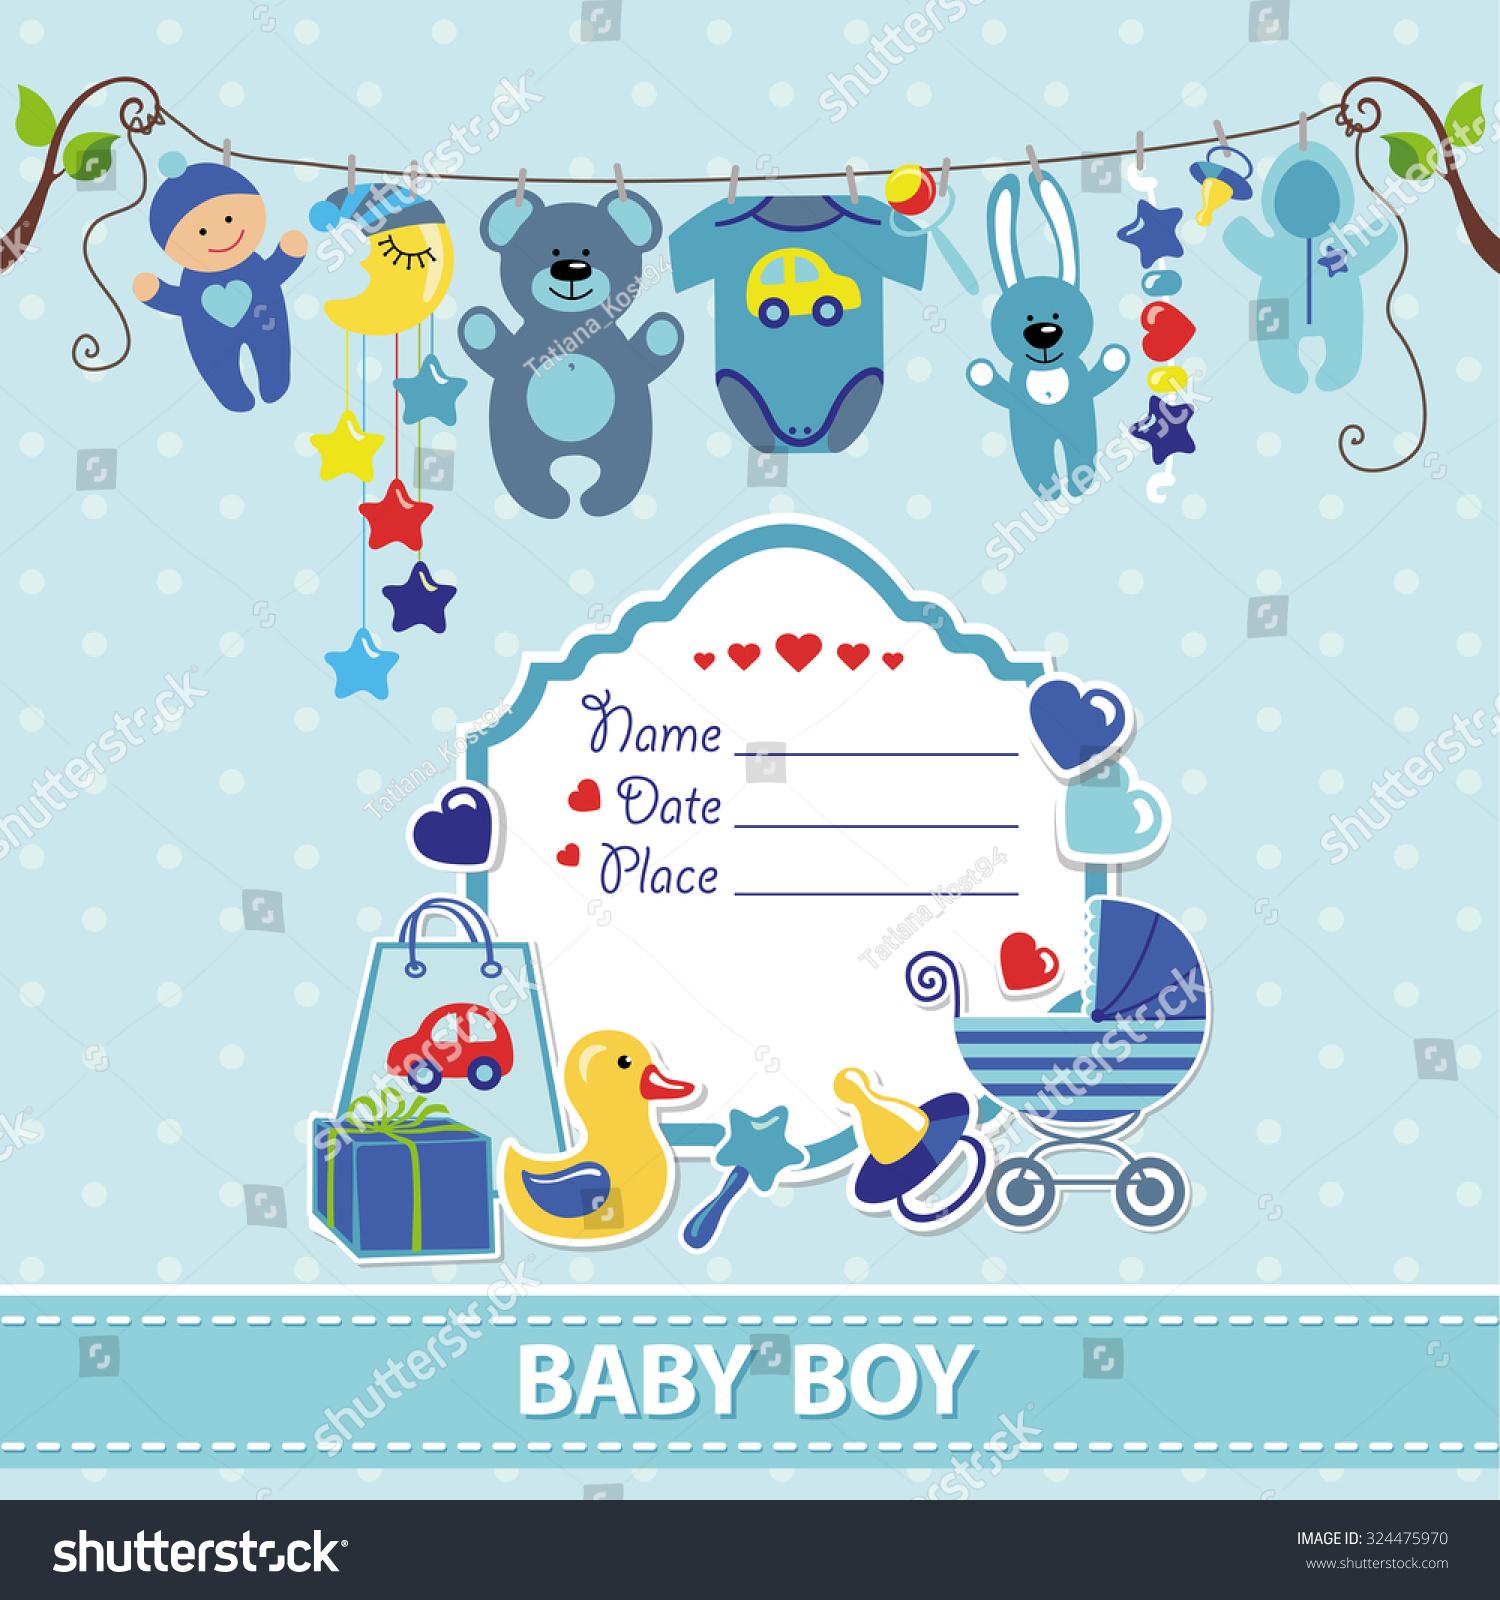 New Born Baby Boy Invitation Shower Stock Vector Royalty Free